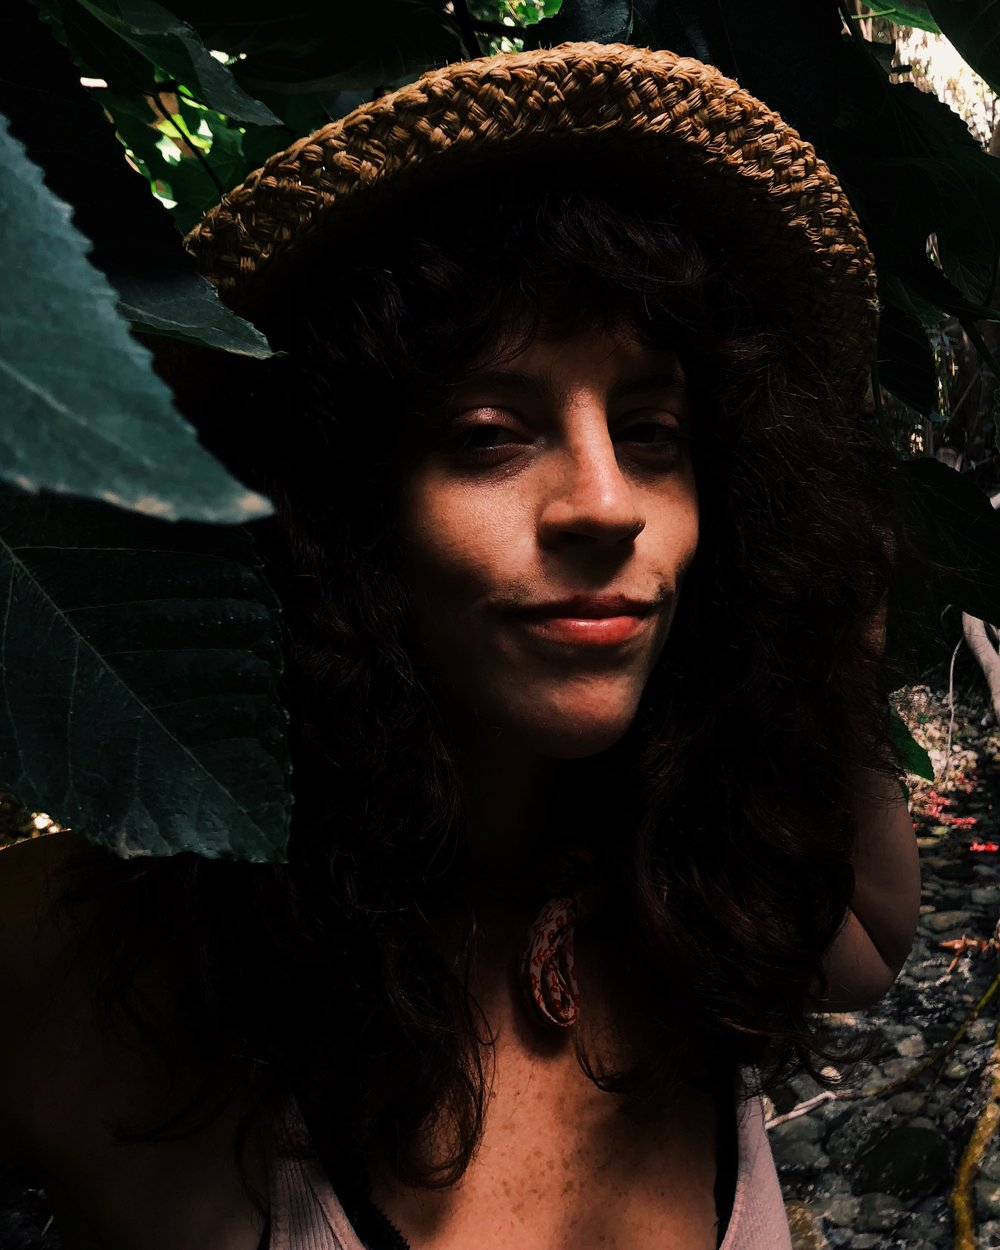 Melanie Odelle by Elle Wildhagen 2.JPG